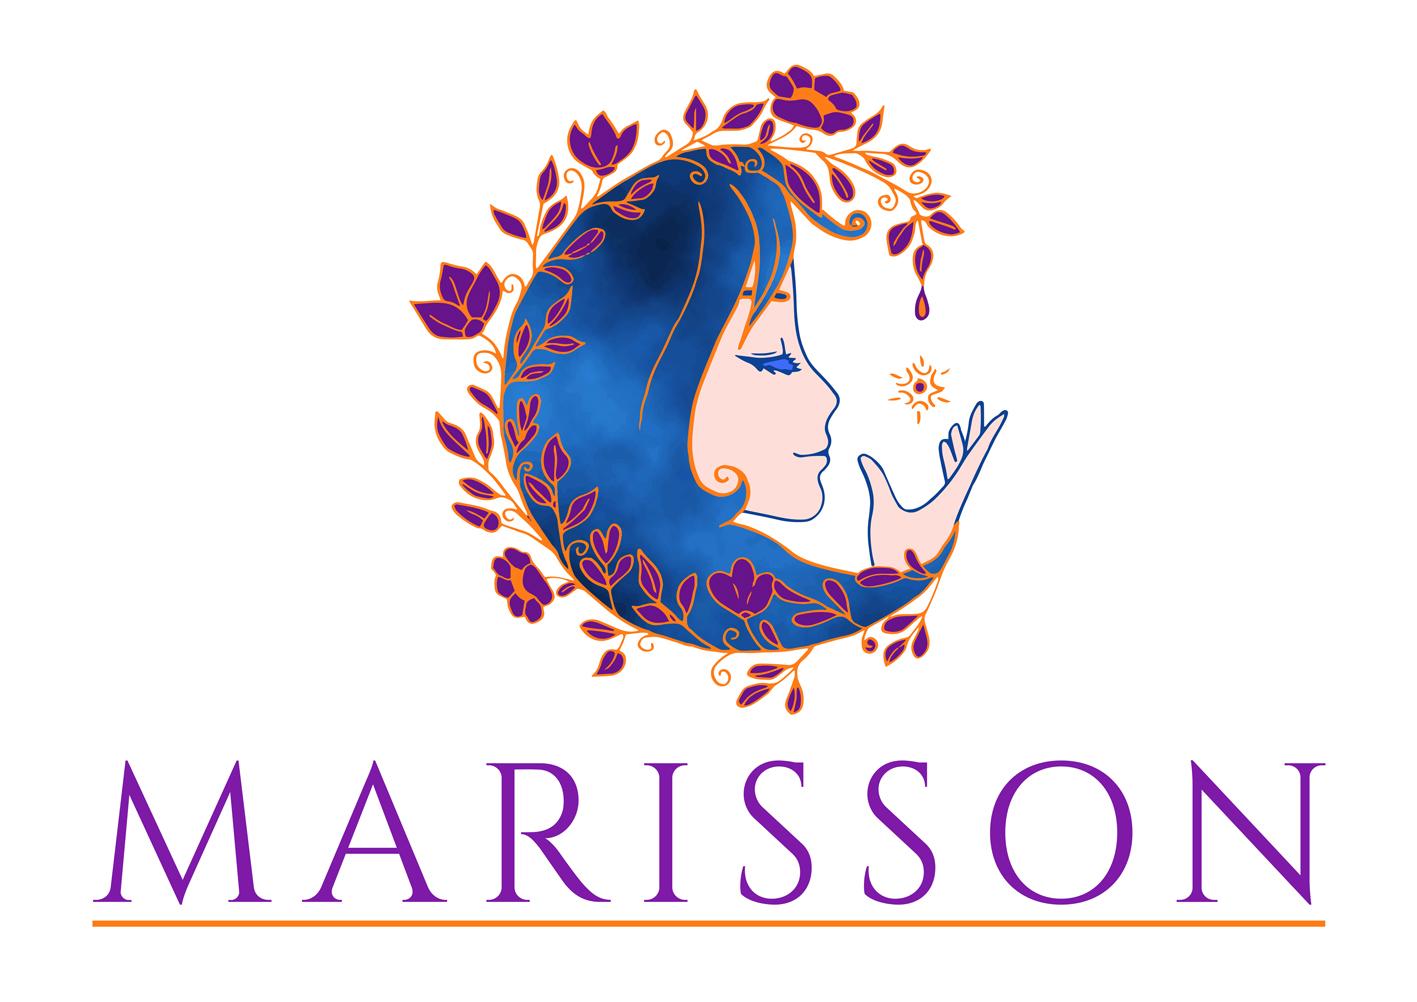 MARISSON **